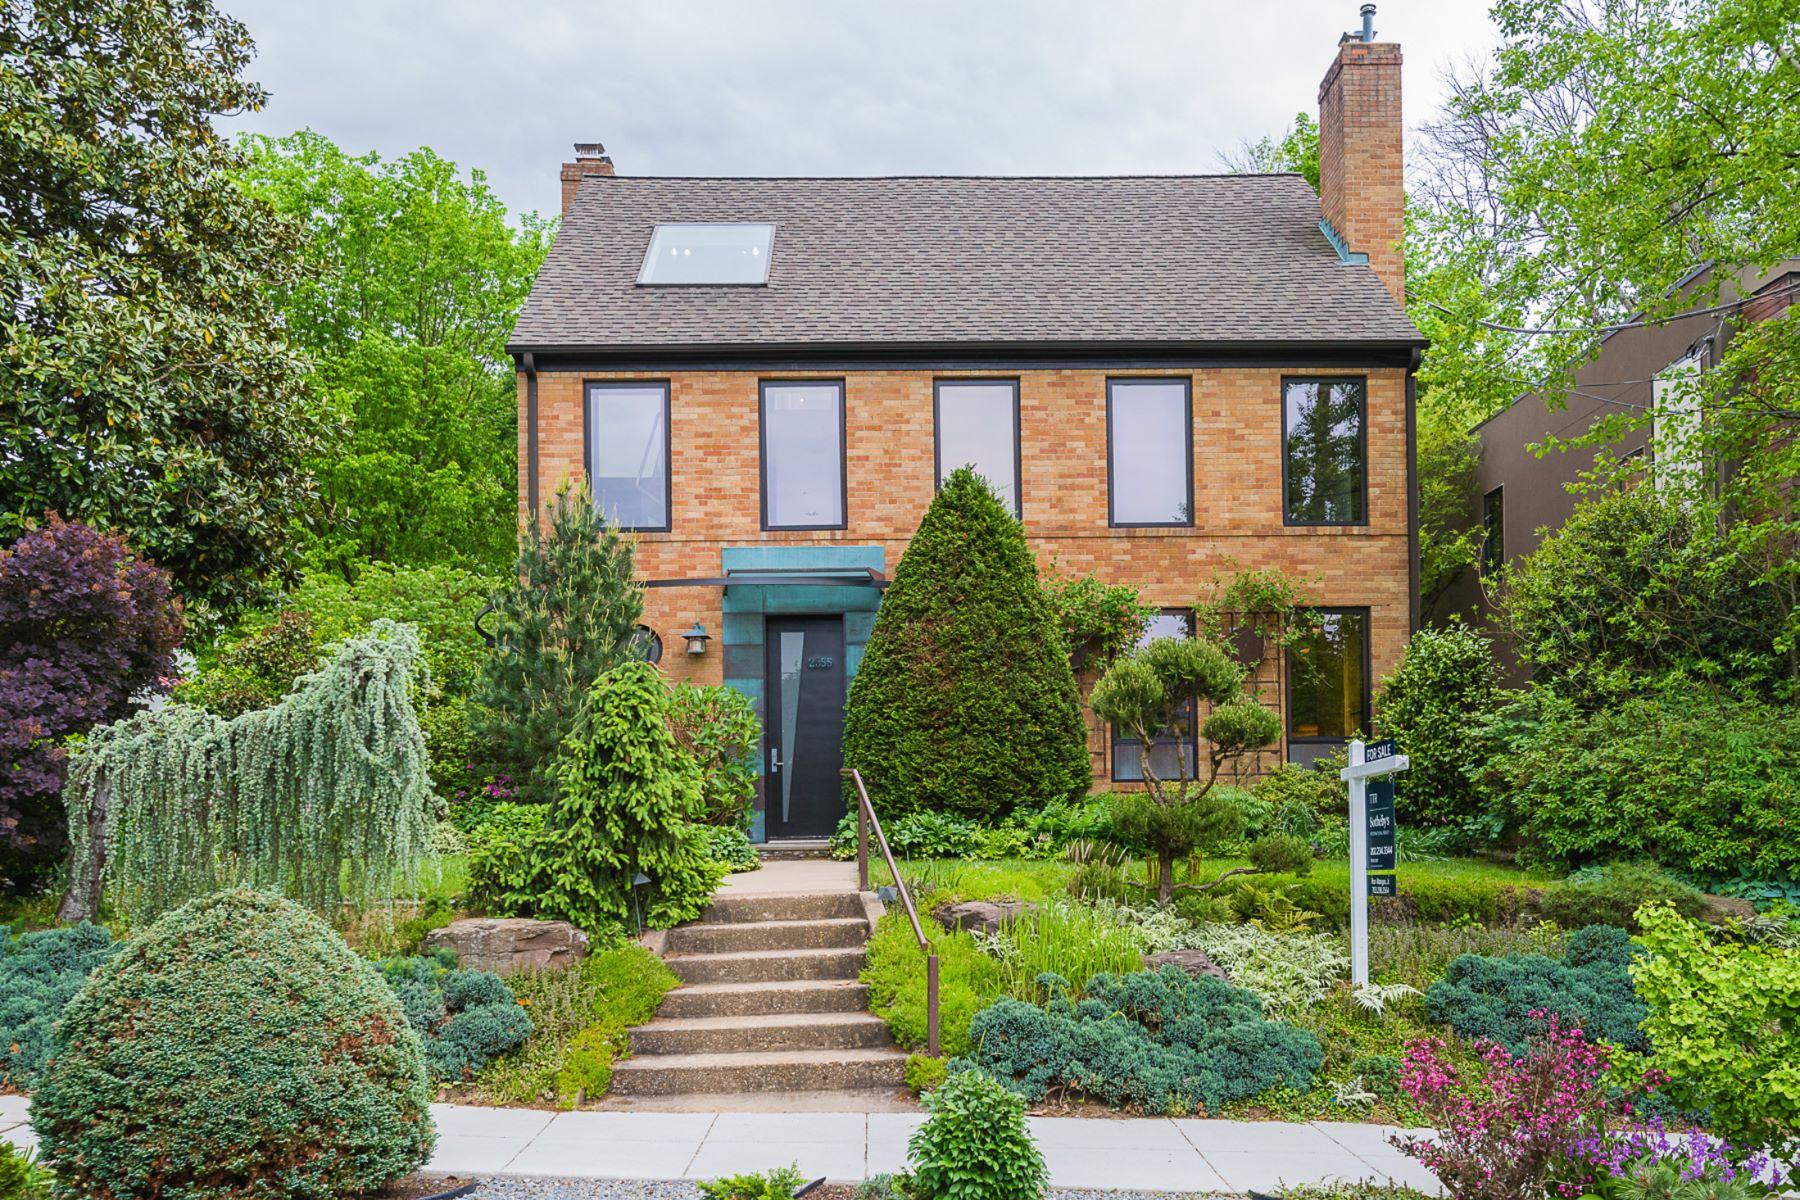 Single Family Home for Sale at 2355 Nebraska Ave. NW 2355 Nebraska Avenue Nw Washington, District Of Columbia 20016 United States